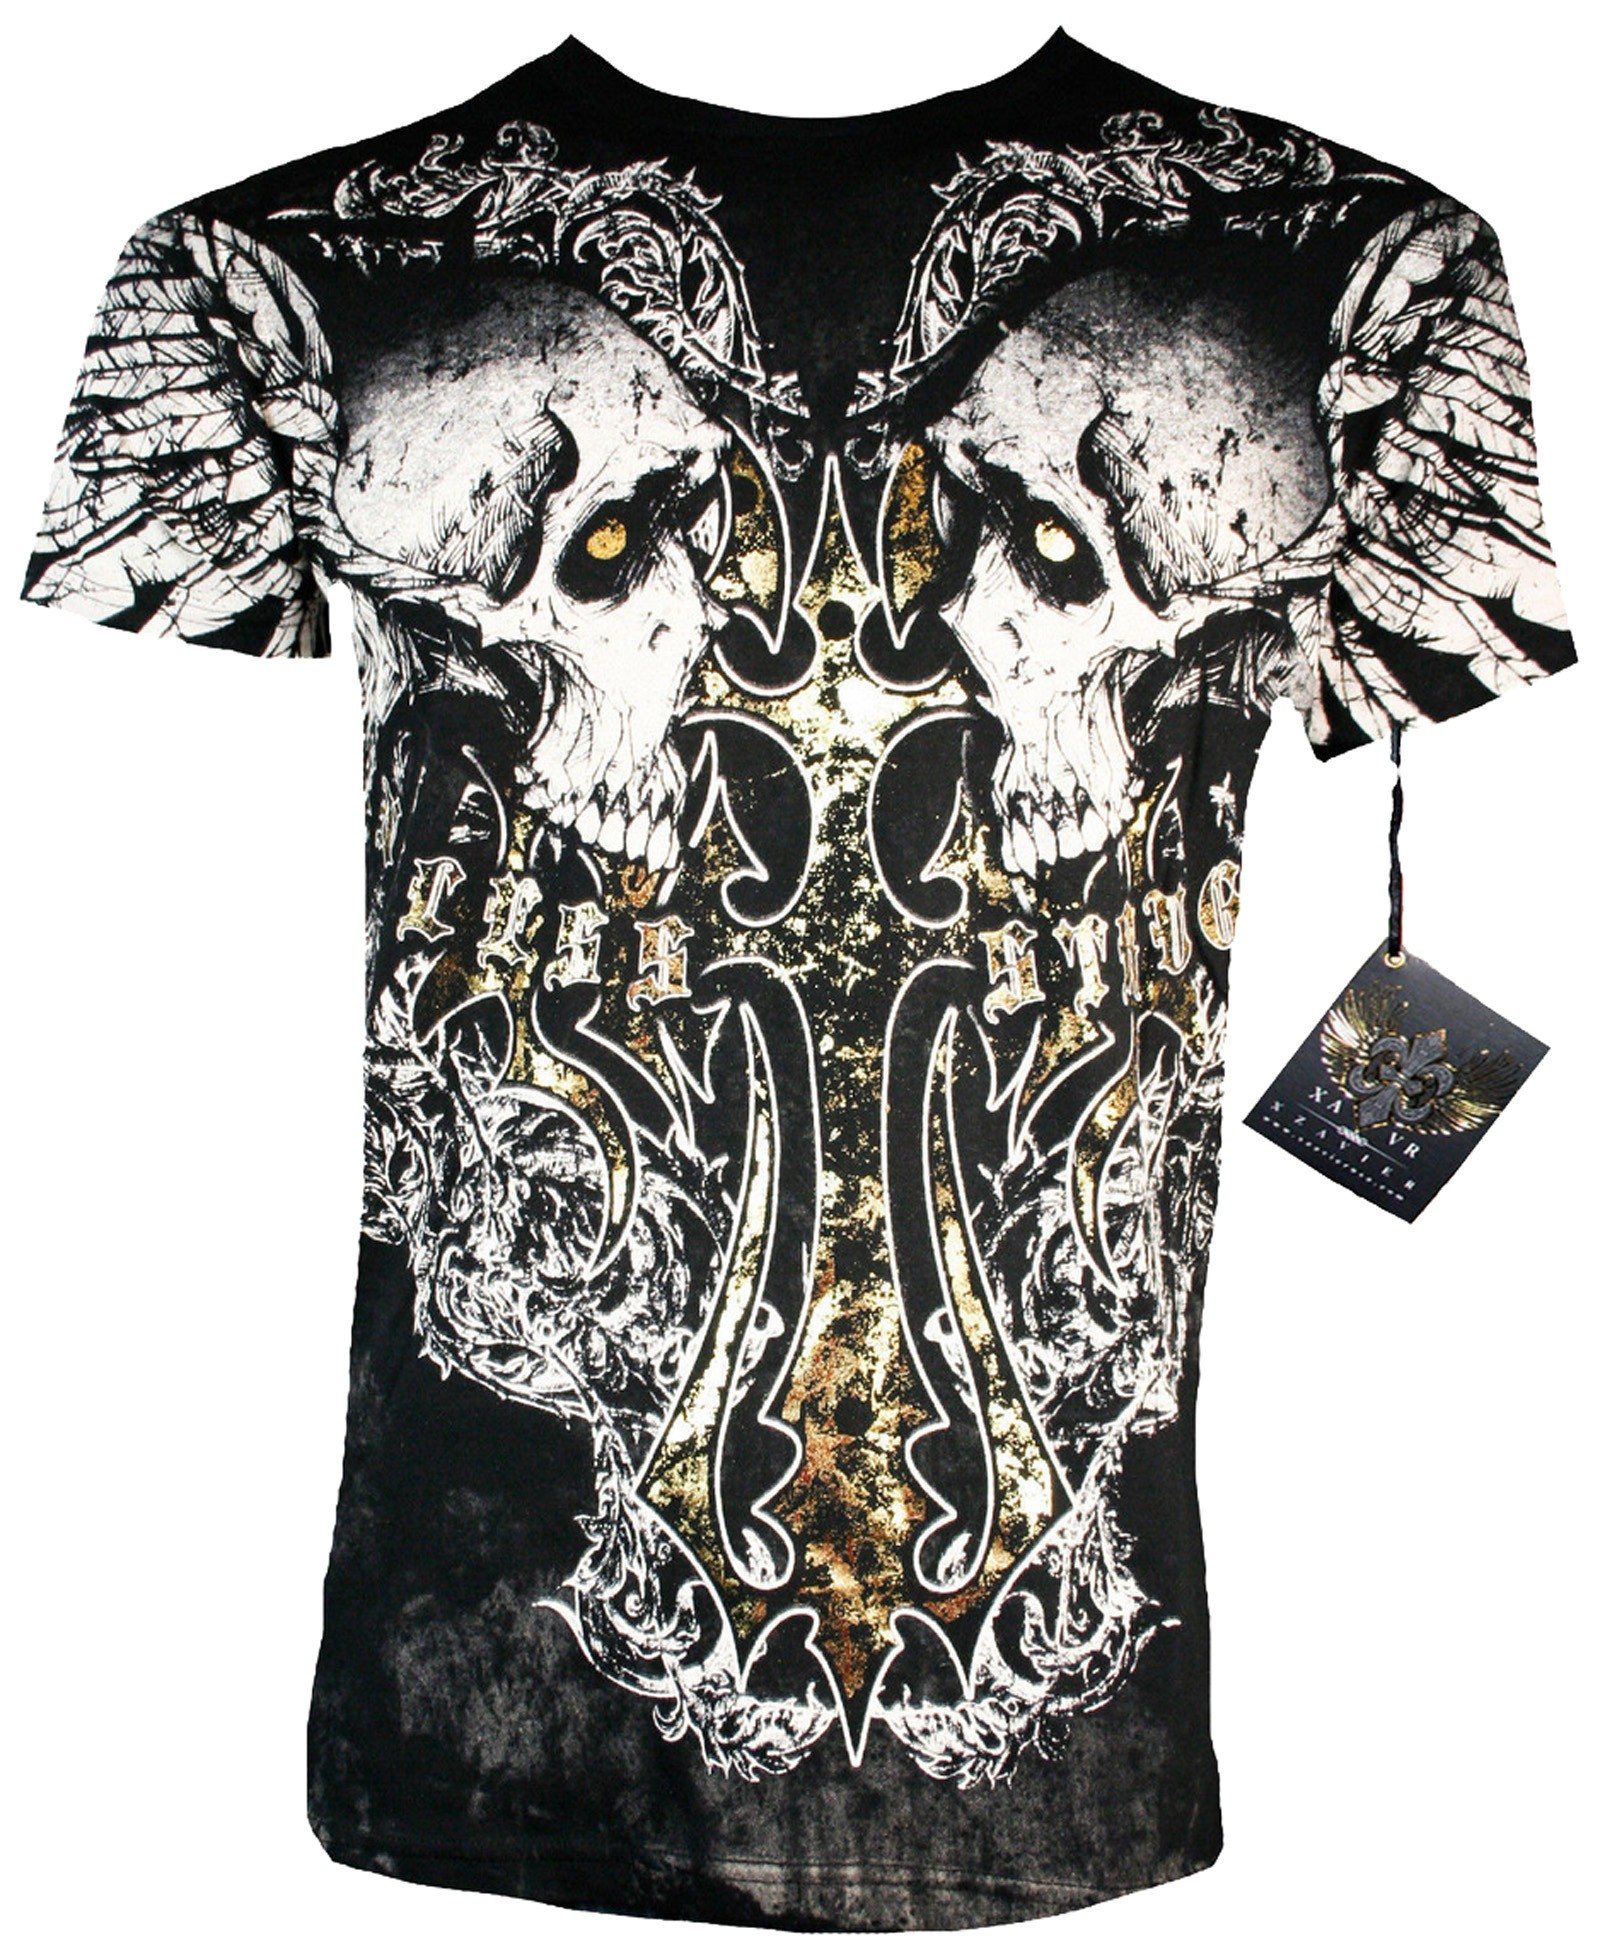 Xzavier - Cross my Bones Skulls T-Shirt